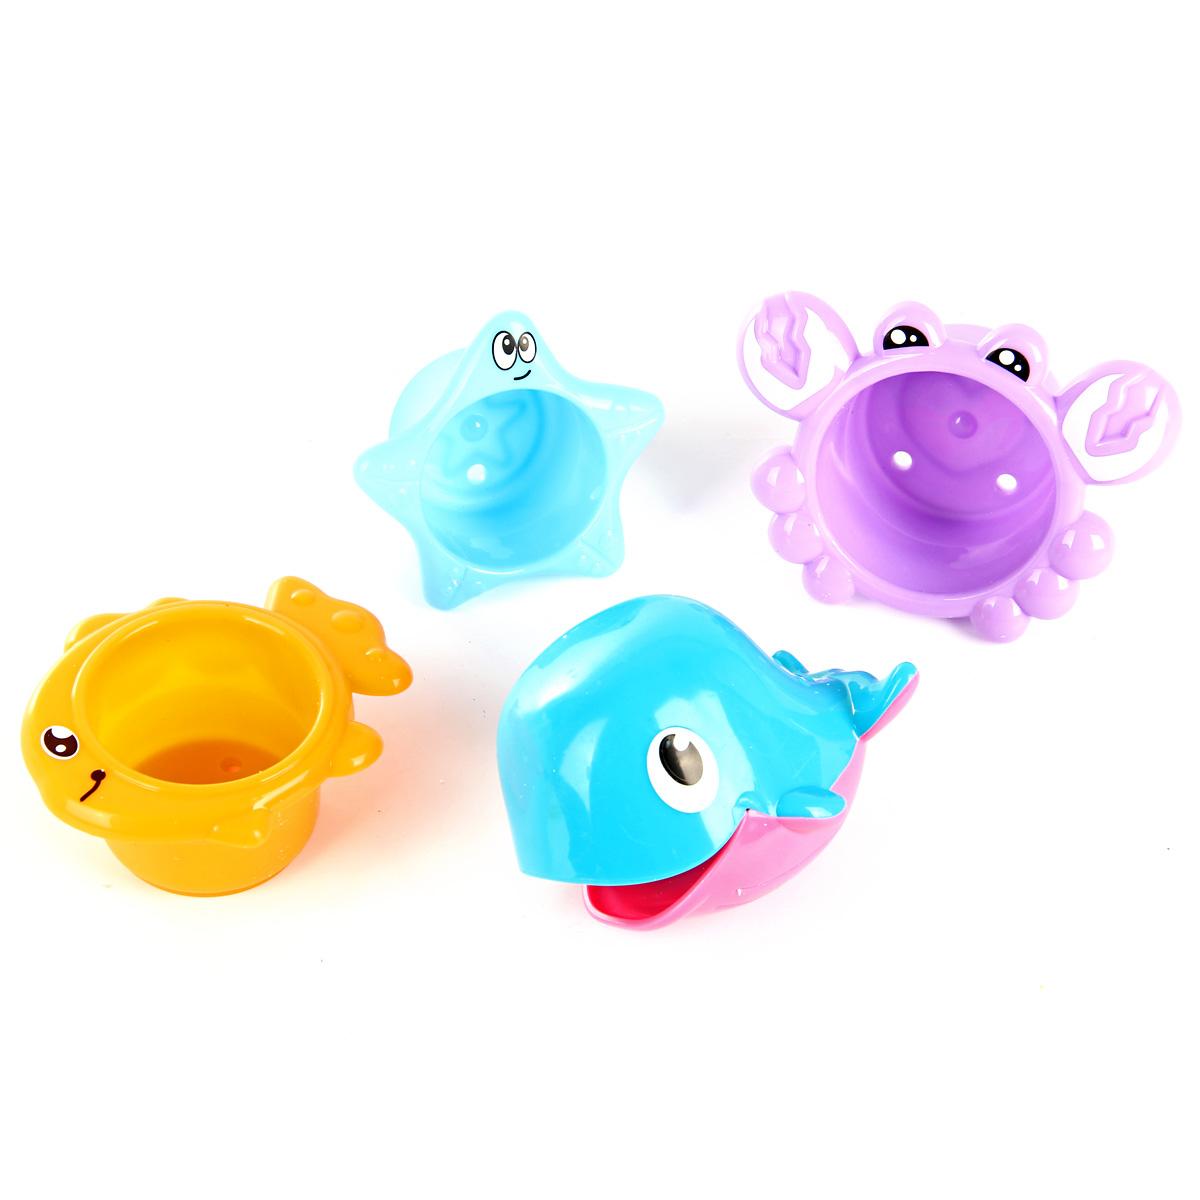 Игрушки для ванны Ути Пути Формочки. Дельфинчик развивающий коврик ути пути цветущий сад